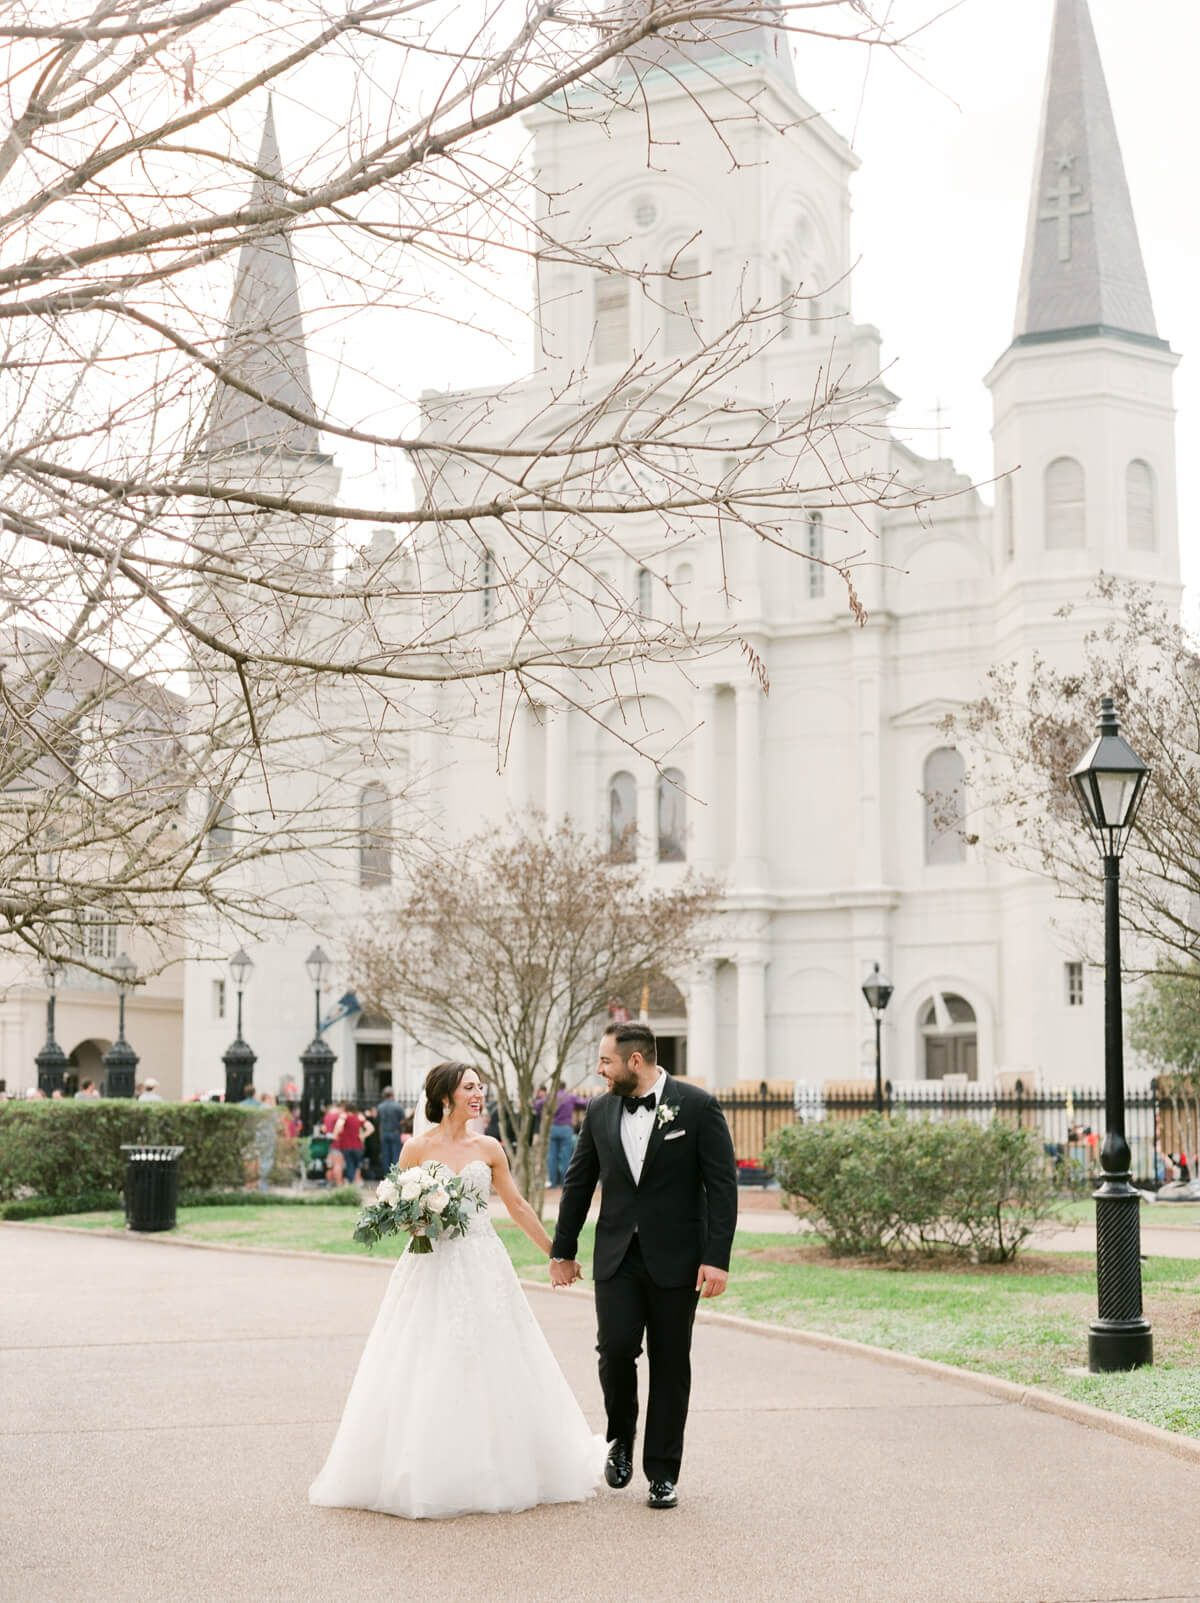 Katherine Martin New Orleans Wedding Lance Nicoll Wedding Photography Film Phot New Orleans Wedding French Quarter Weddings St Louis Wedding Photography